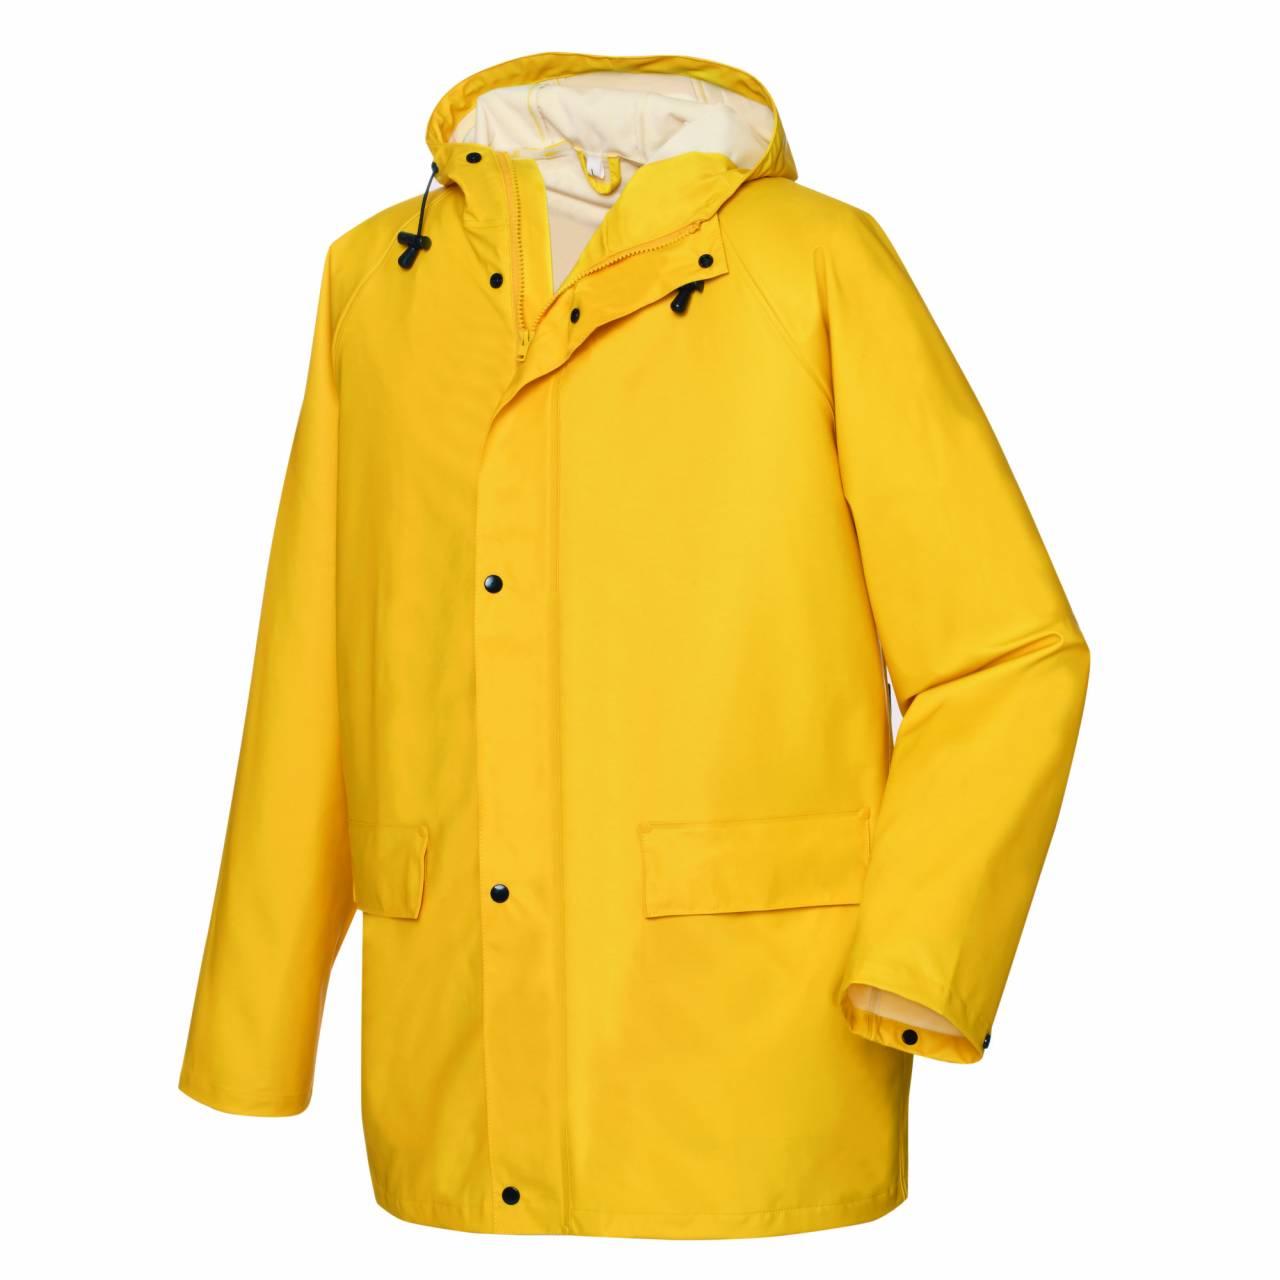 Regenschutzjacke, Gelb, Gr. M